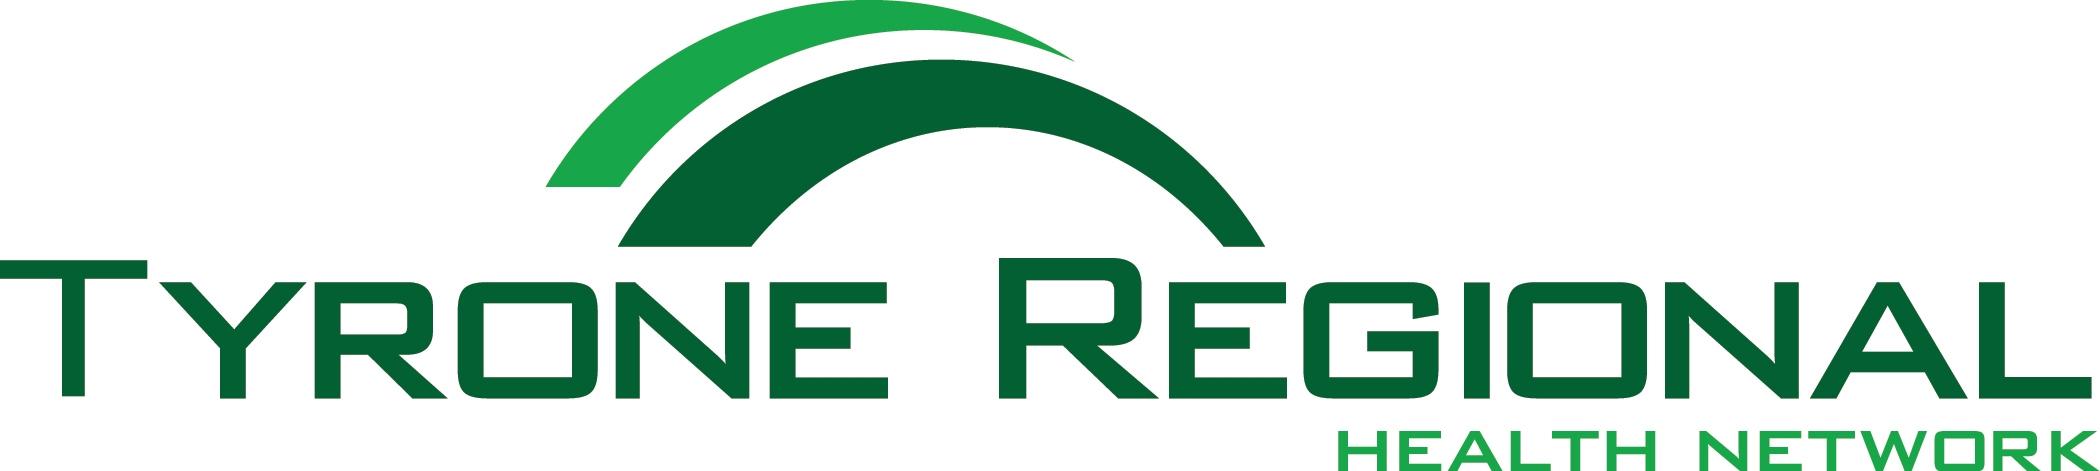 Tyrone Regional Health Network New Sept2015_1442595909889.JPG